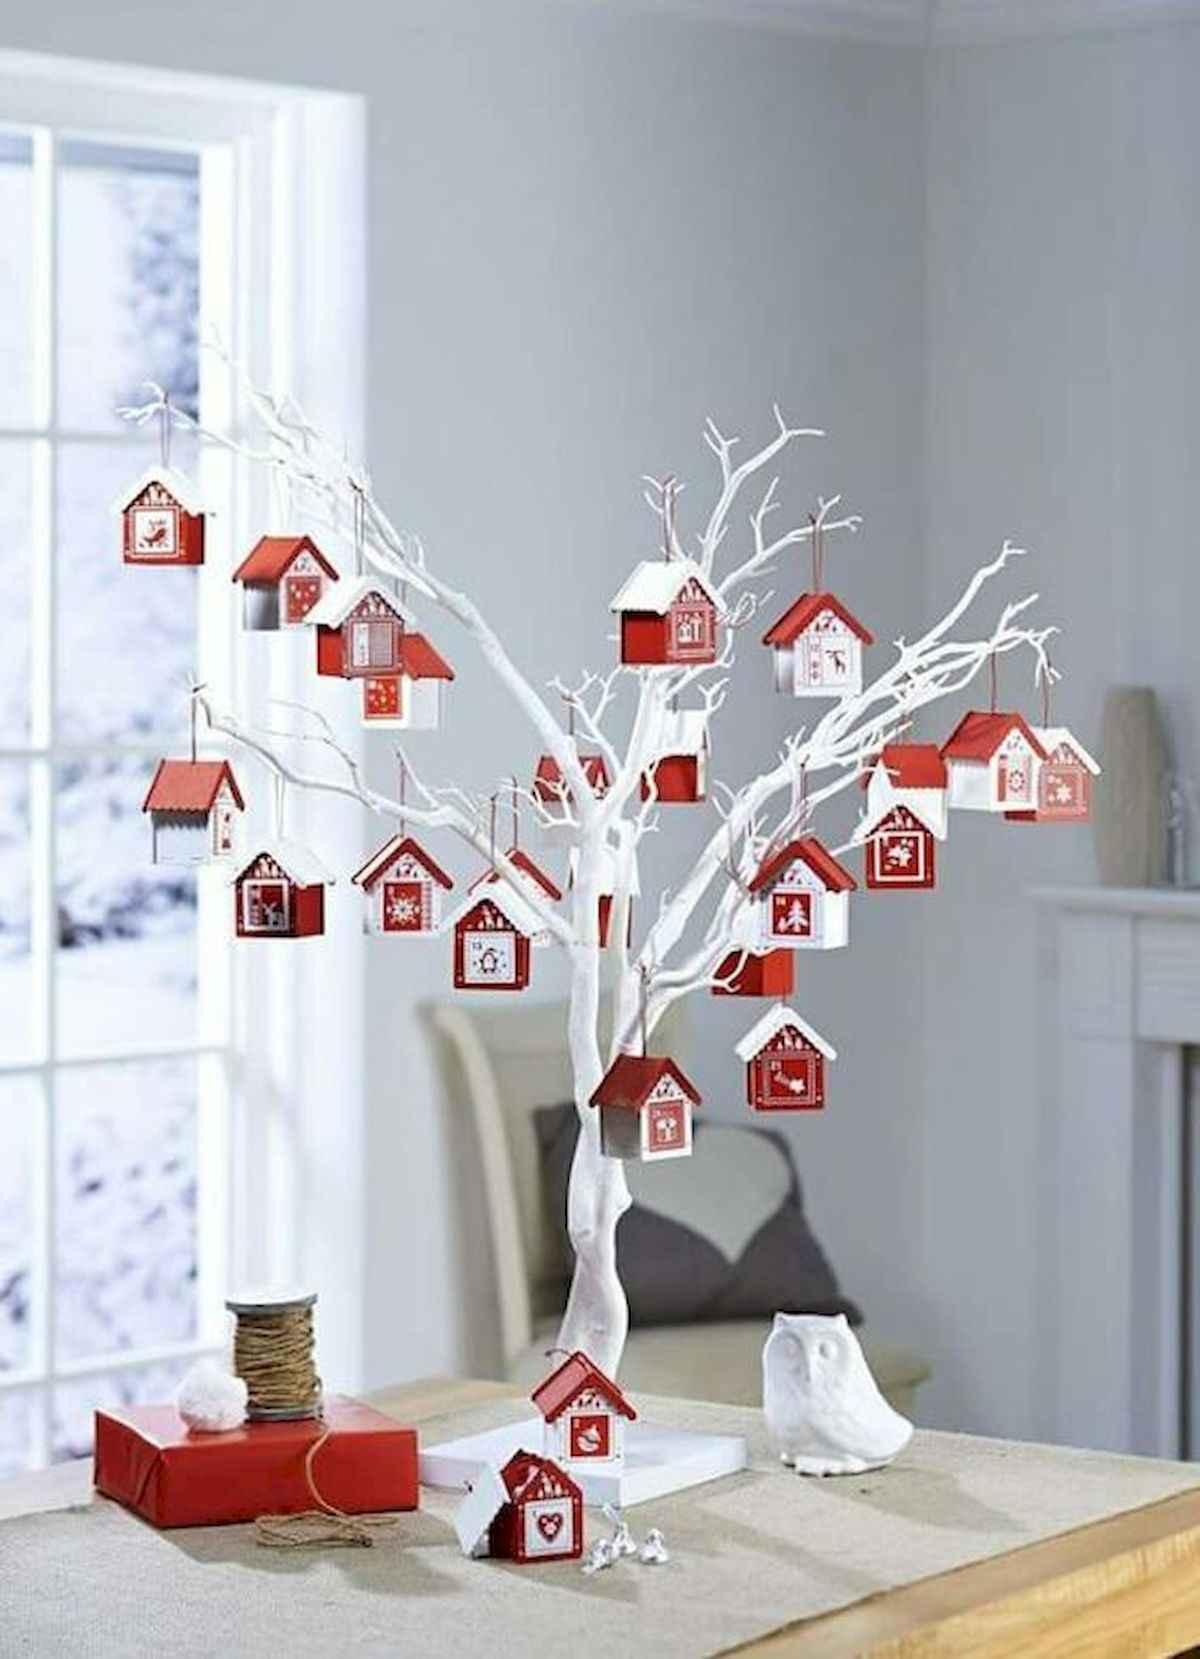 50 diy christmas decorations ideas (13)